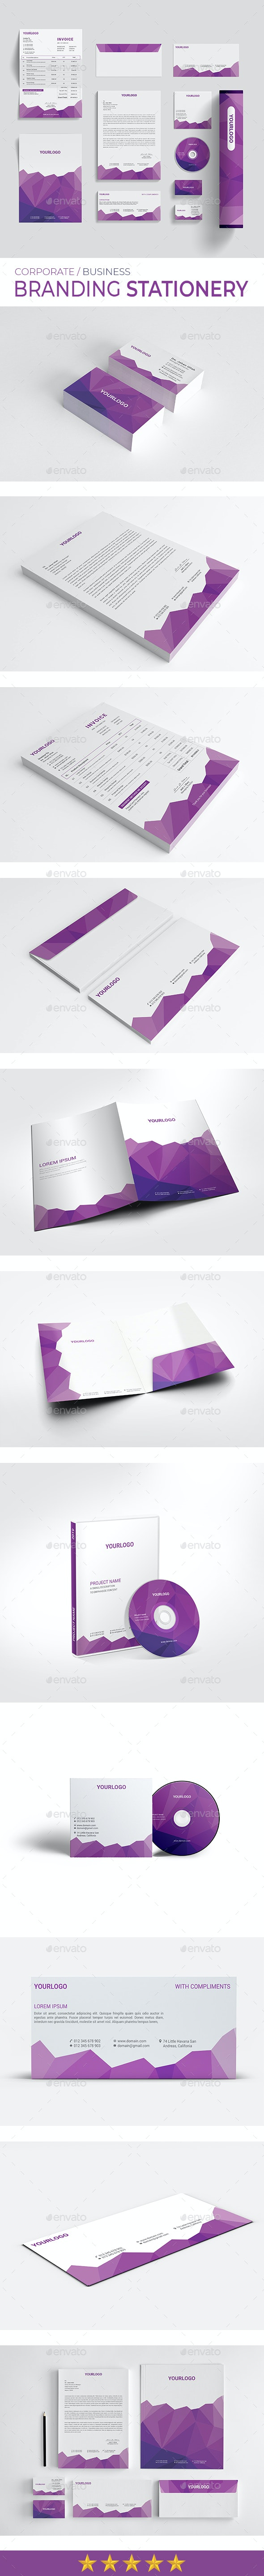 Corporate Branding Stationery - Stationery Print Templates